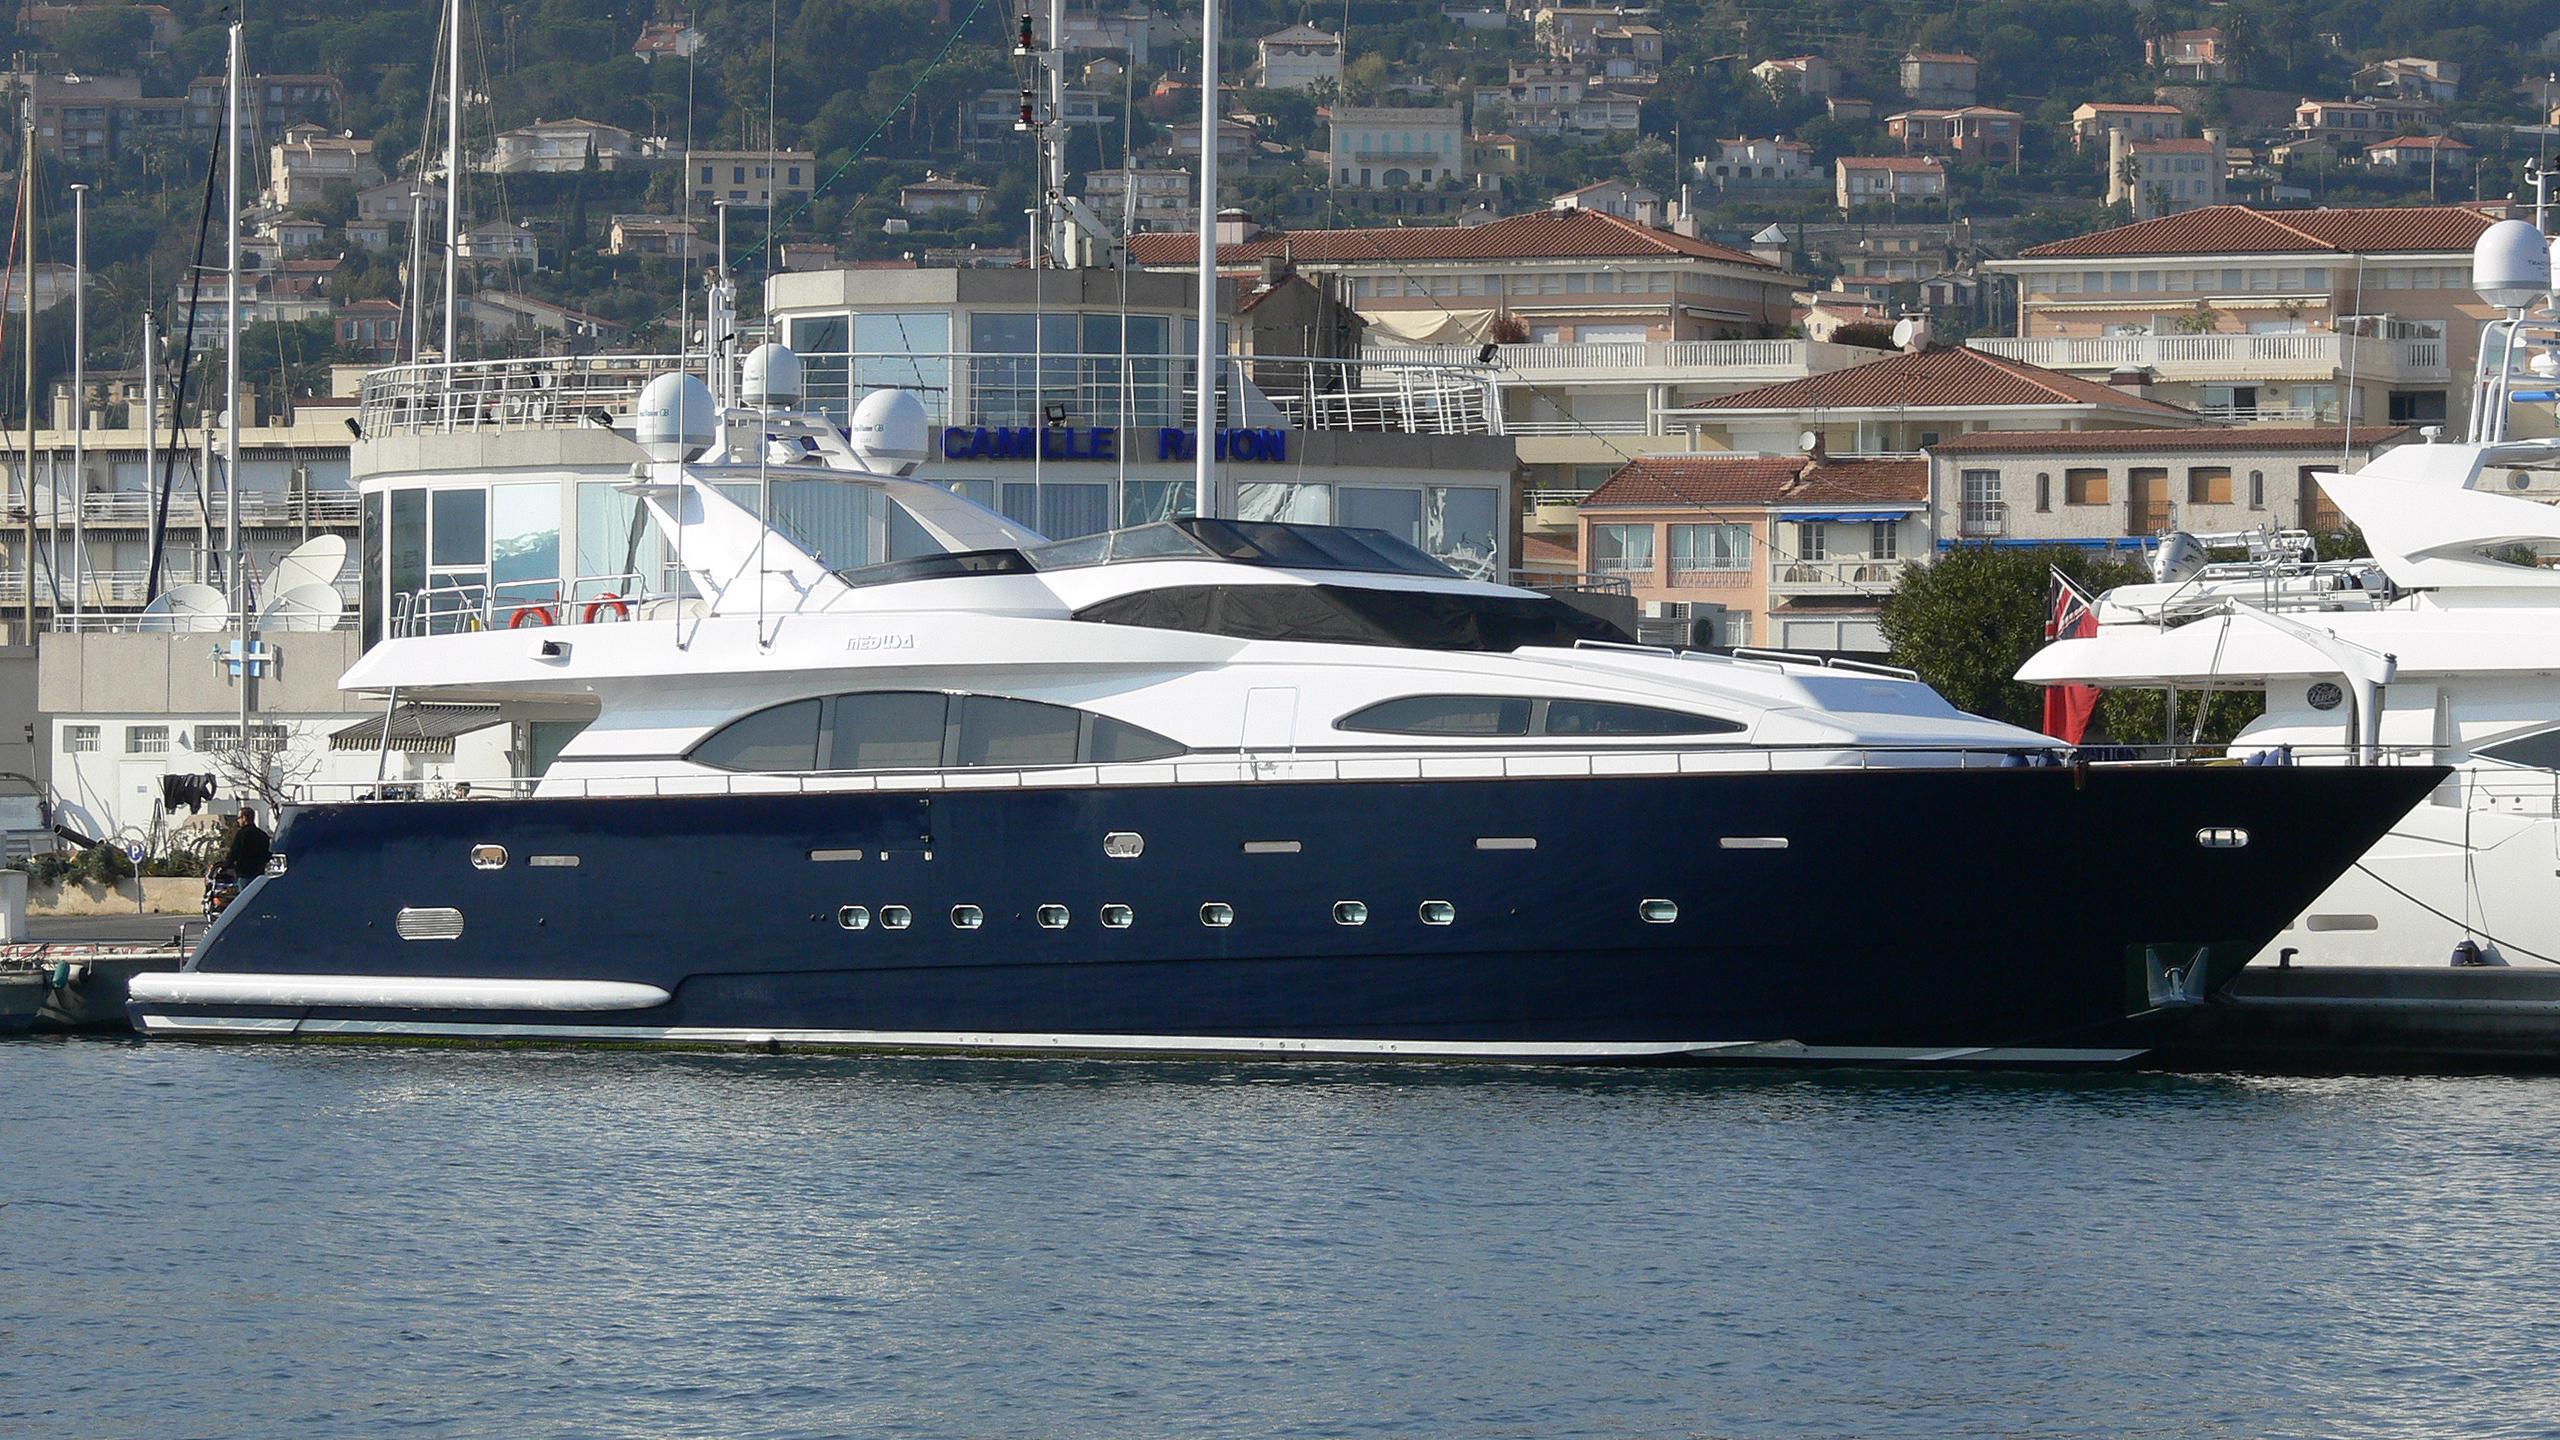 medusa-g-yacht-exterior